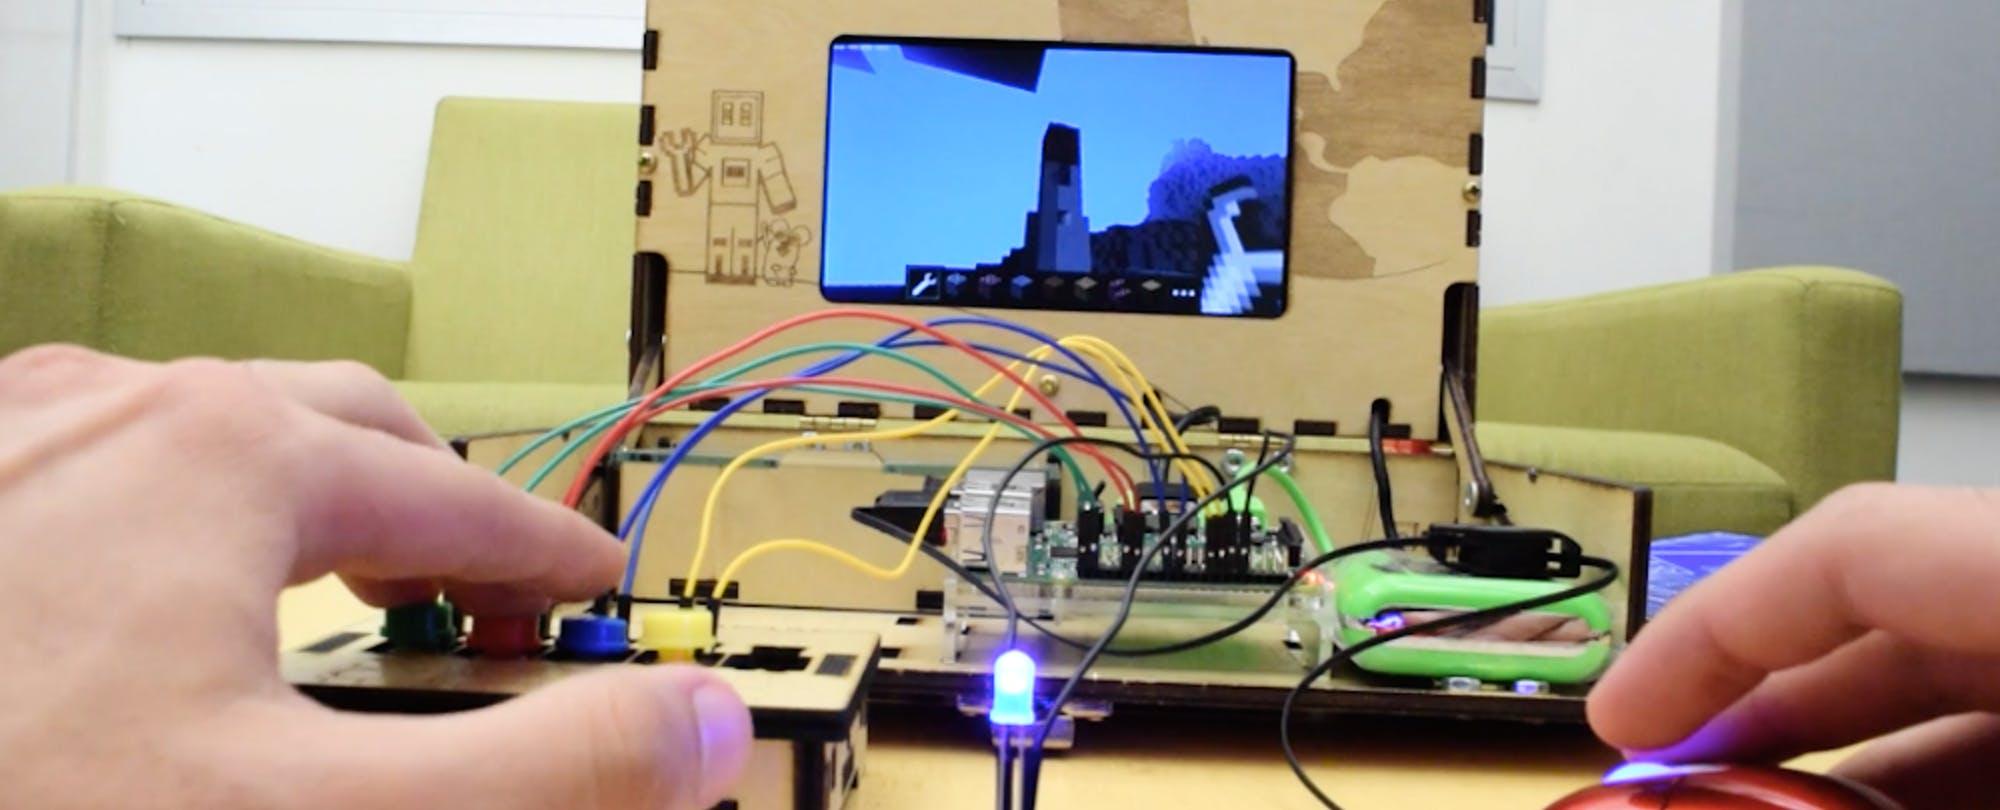 Piper Raises $2.1 Million to Teach Kids to Code Through Minecraft